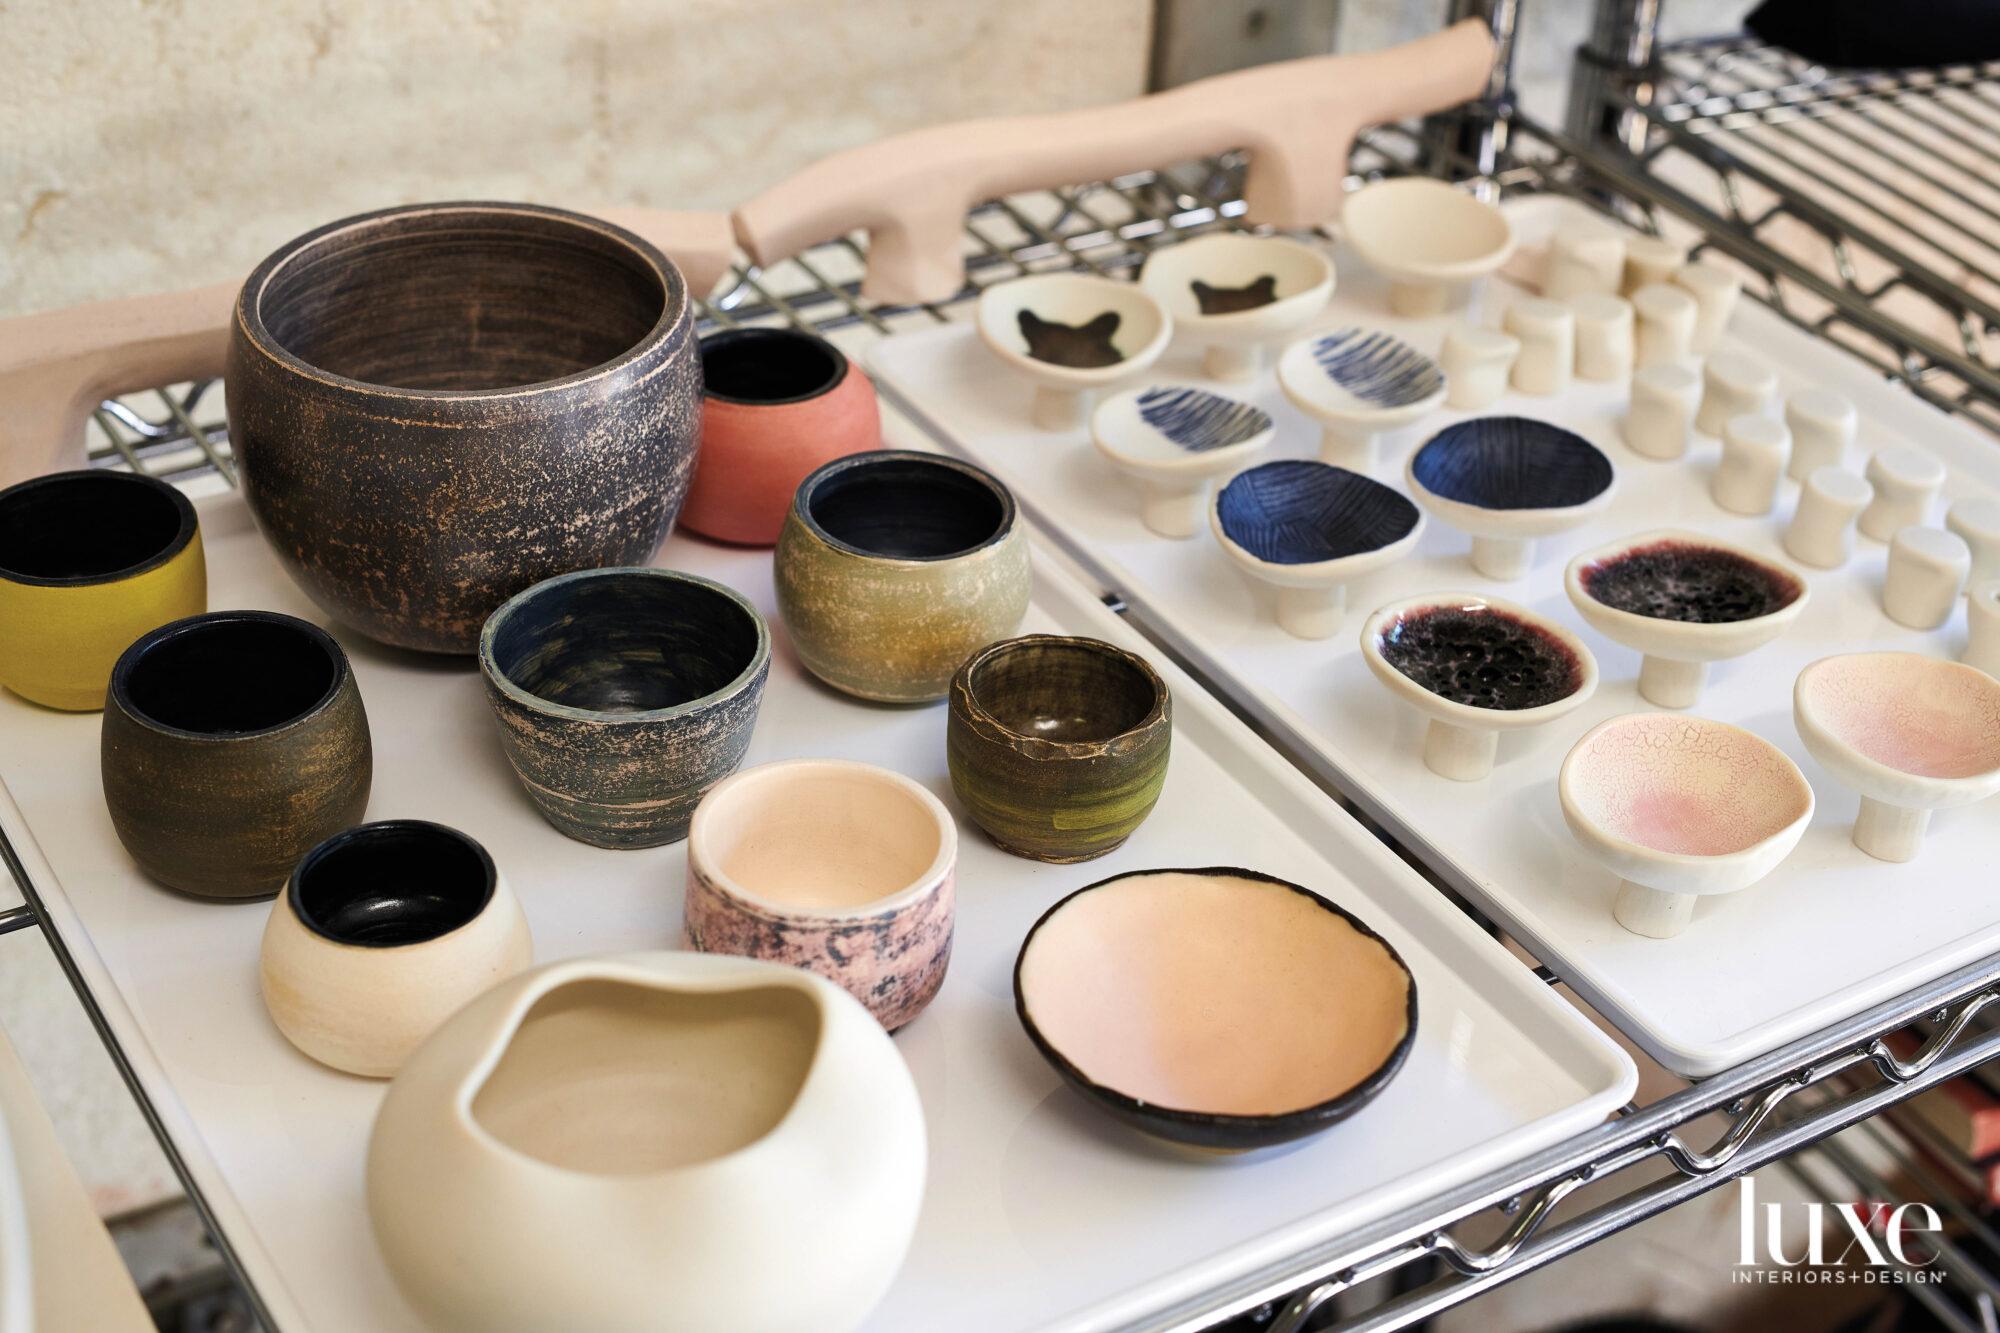 A collection of smaller ceramic pieces.